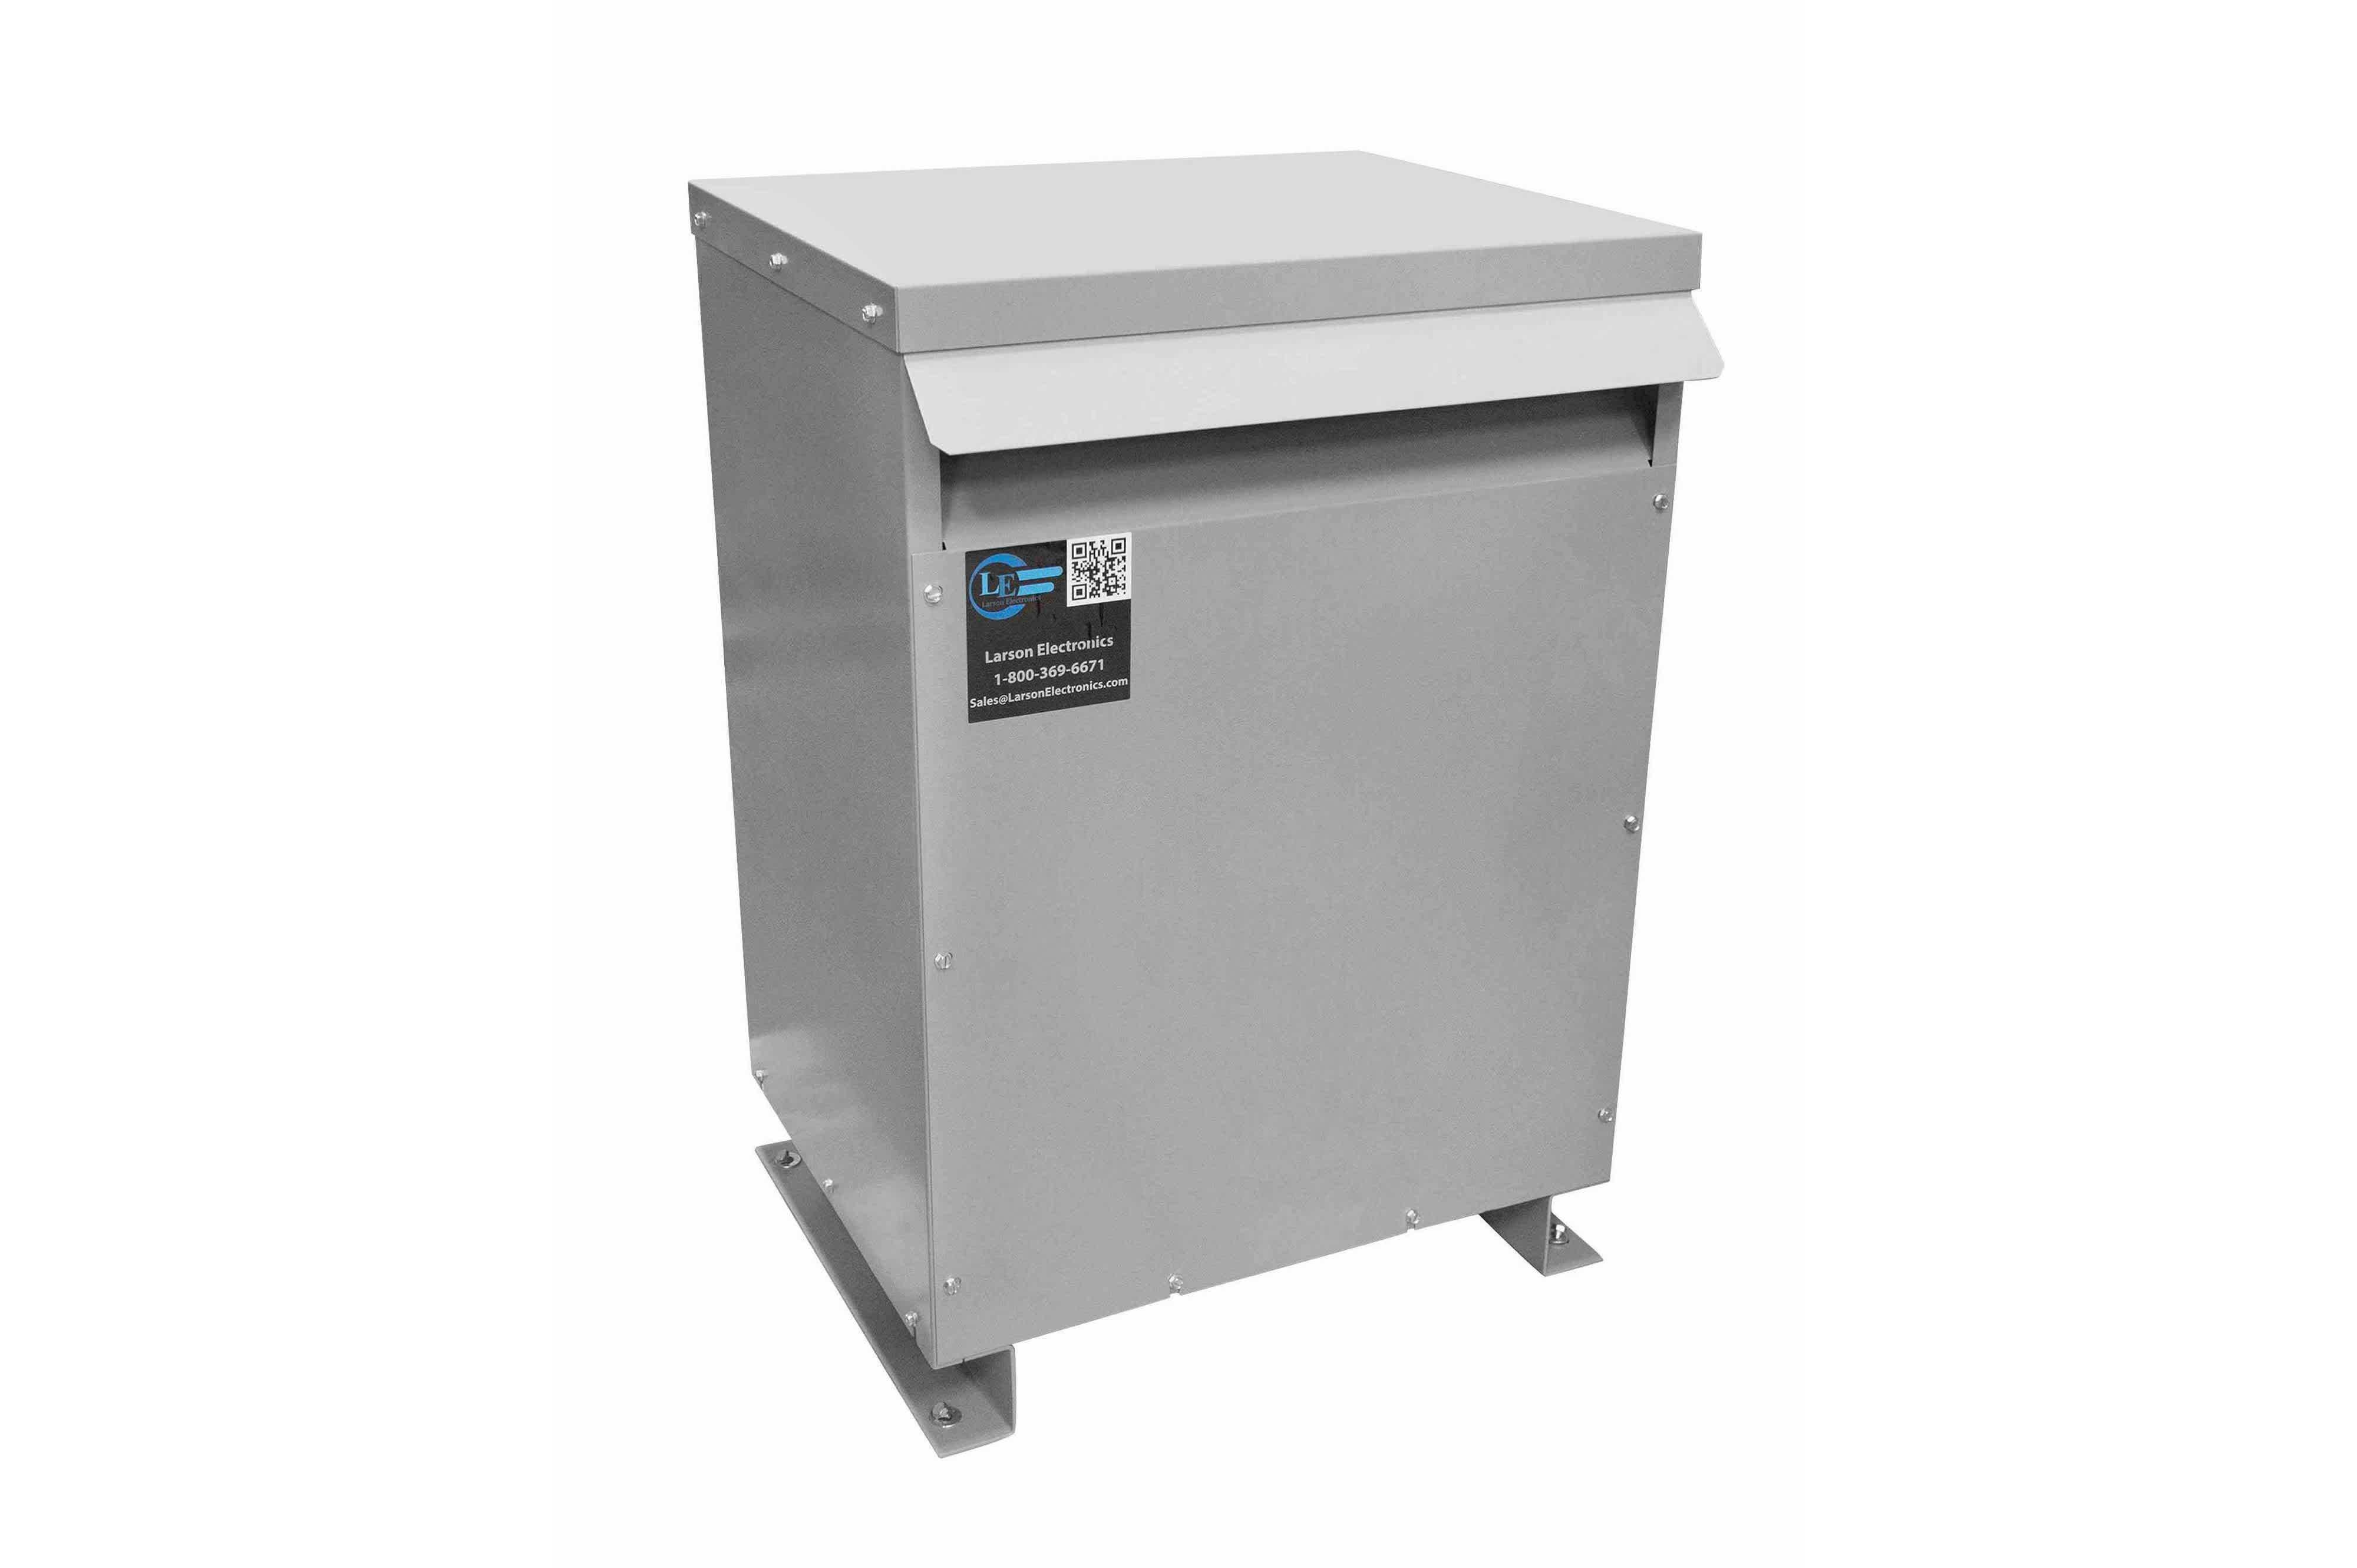 900 kVA 3PH Isolation Transformer, 460V Wye Primary, 575Y/332 Wye-N Secondary, N3R, Ventilated, 60 Hz